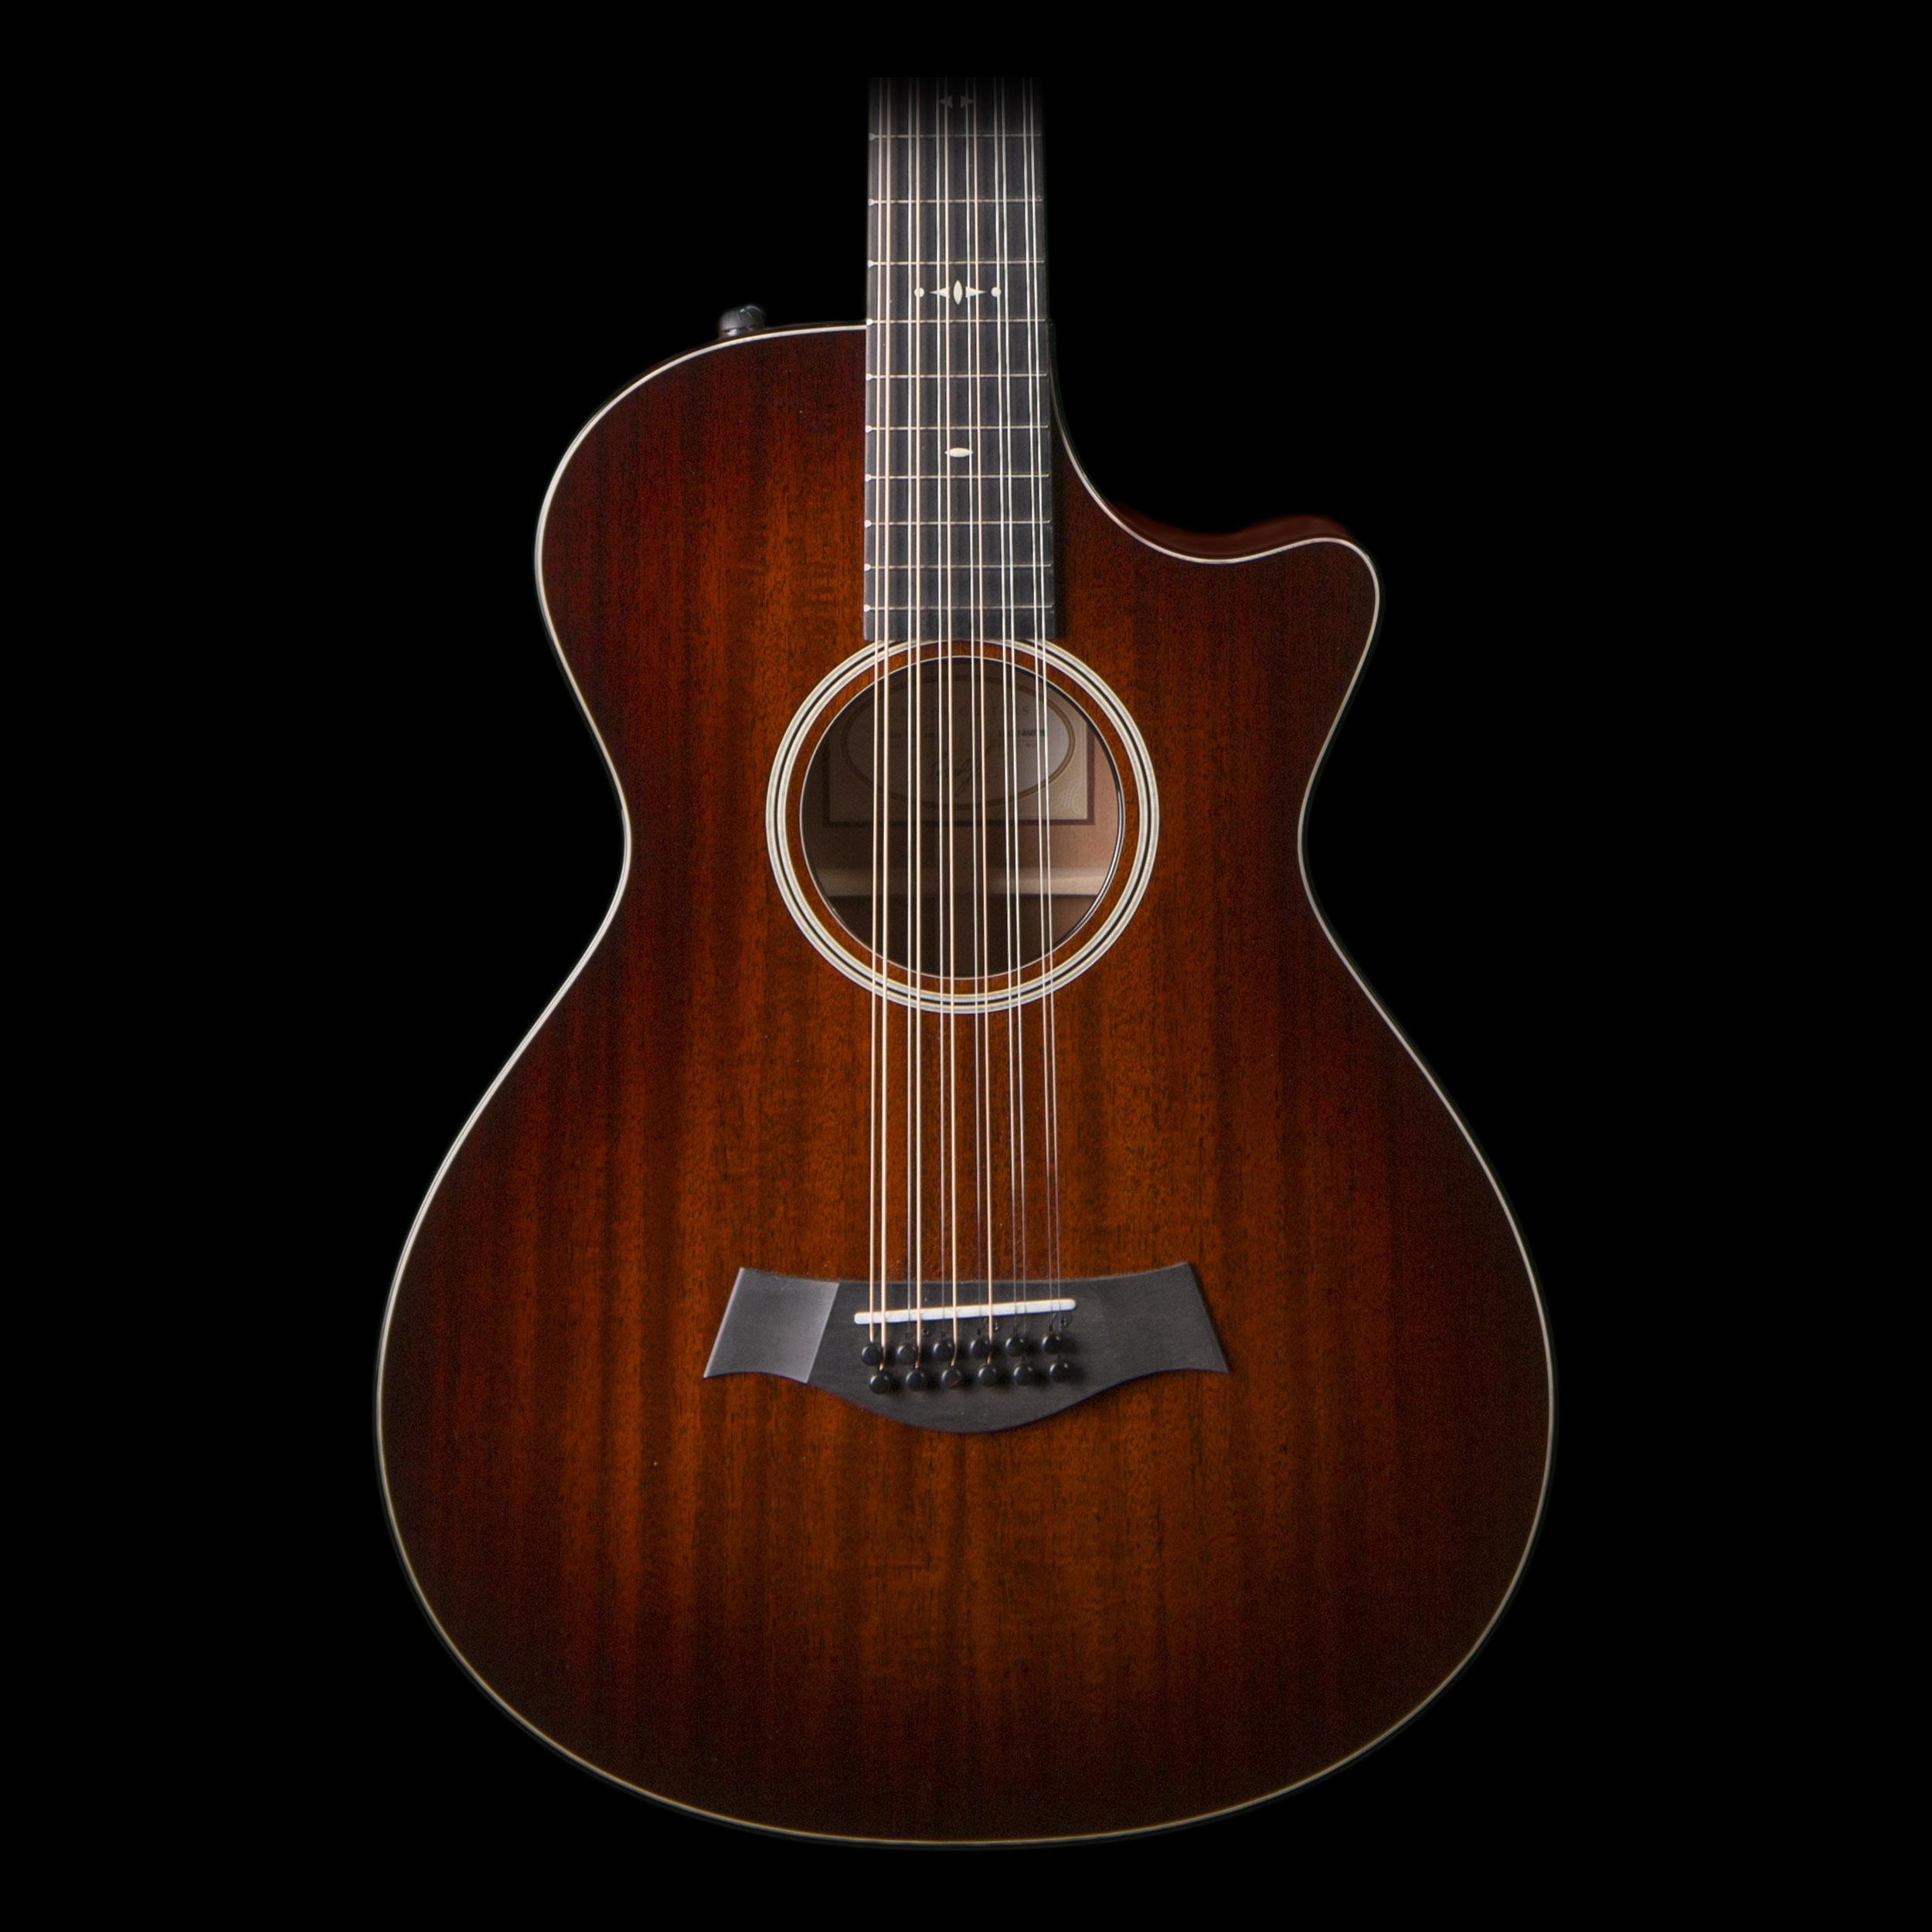 taylor 562ce 12 string grand concert acoustic electric guitar w case. Black Bedroom Furniture Sets. Home Design Ideas